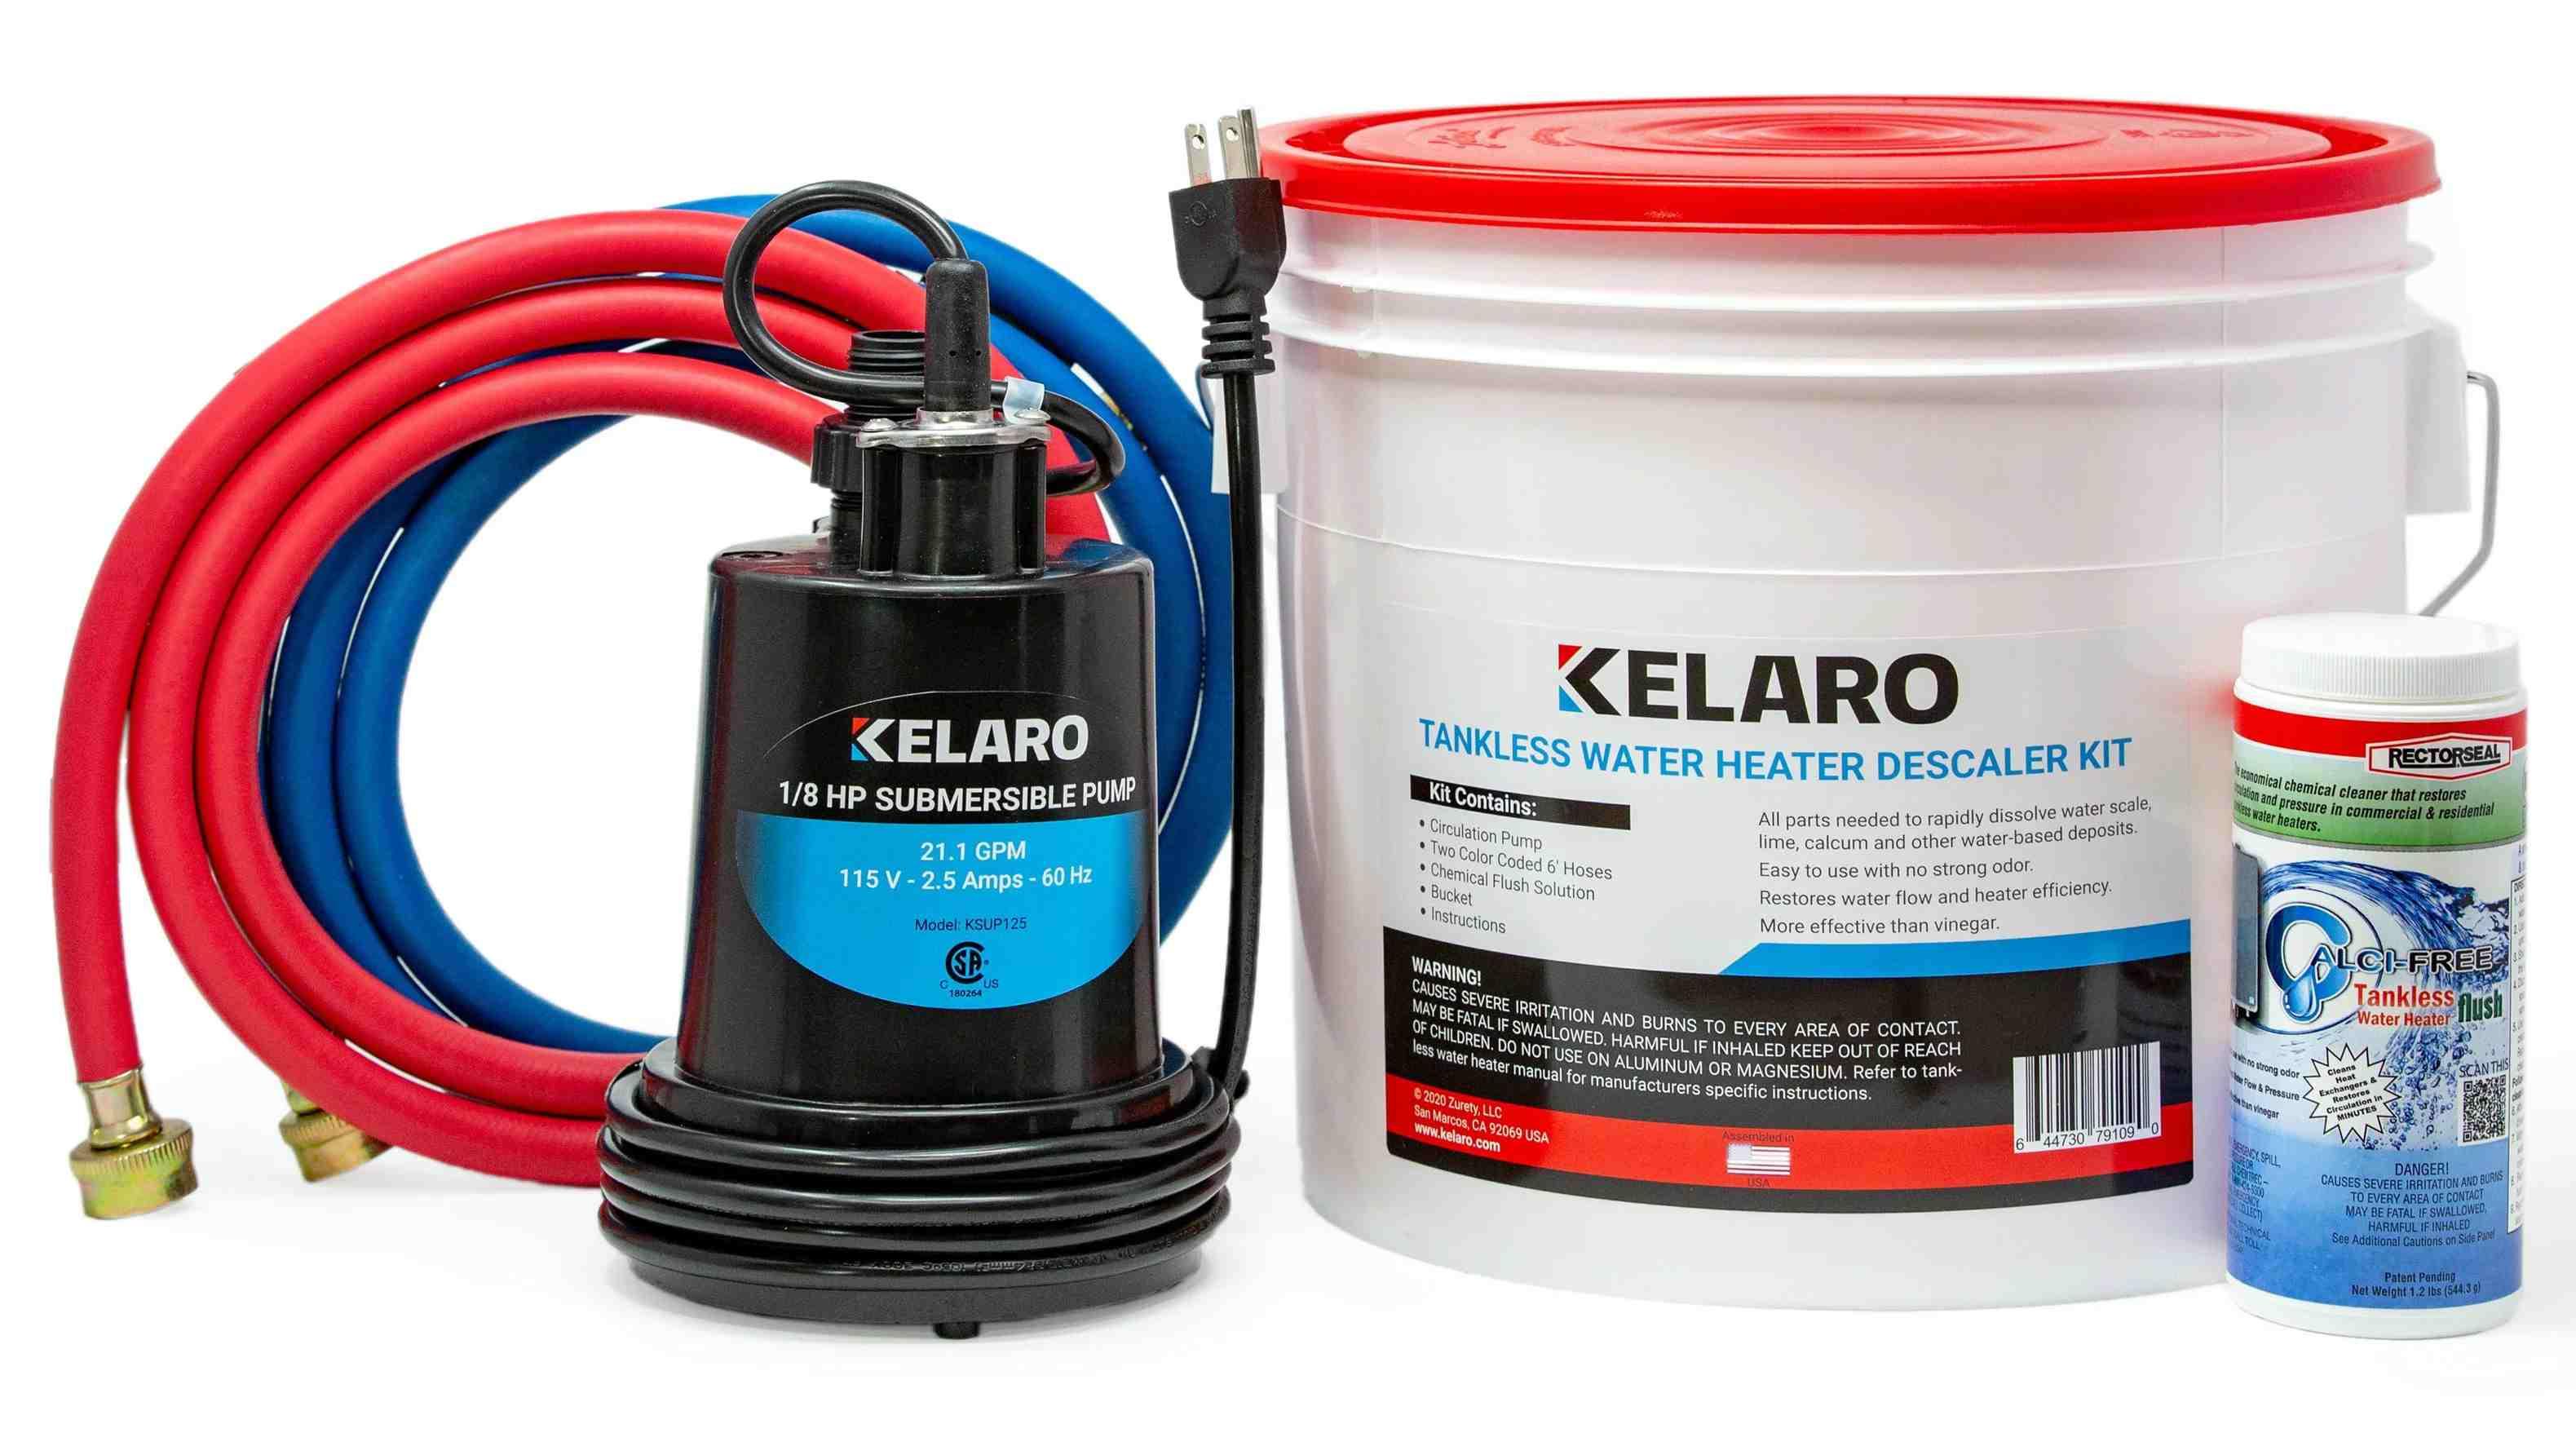 Kelaro Tankless Water Heater Flushing Kit With Rectorseal Calci Free Walmart Com Walmart Com